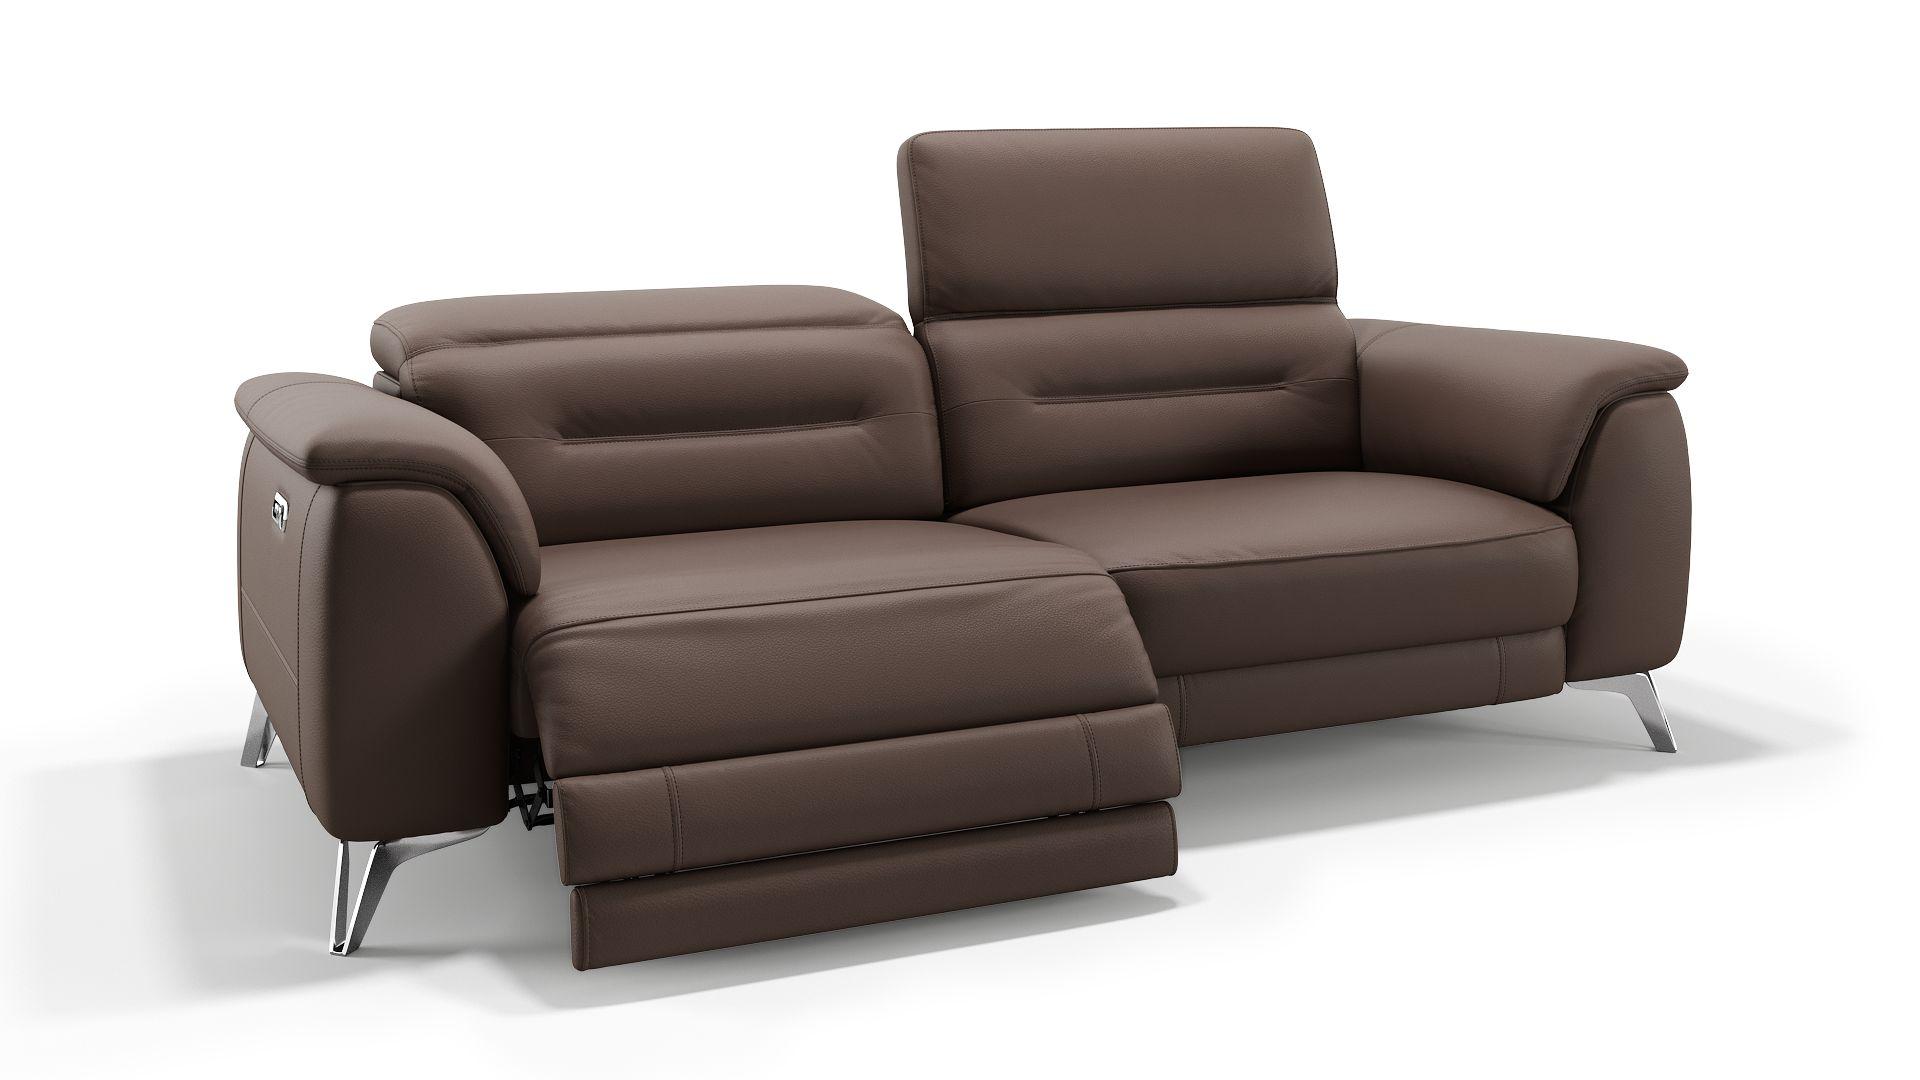 Leder 3-Sitzer Sofa GANDINO